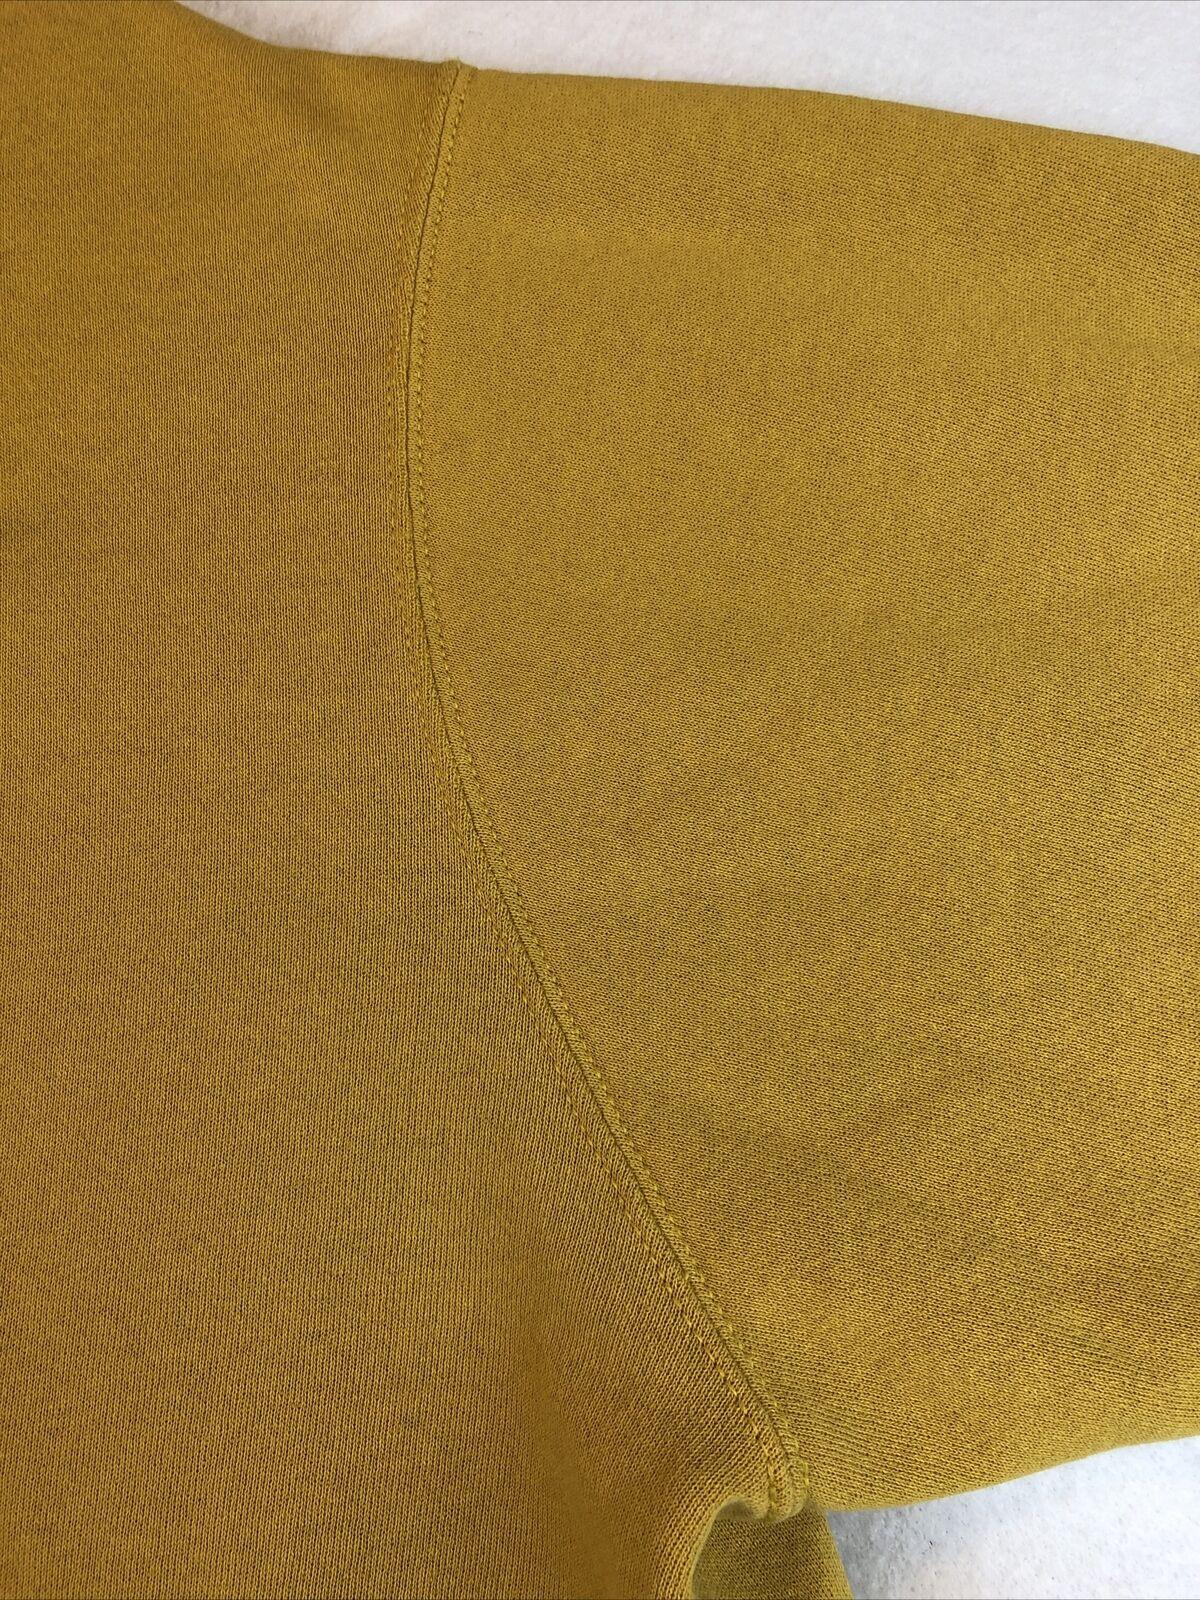 VTG Nike Rare Mustard Yellow Hoodie Sweatshirt Si… - image 11